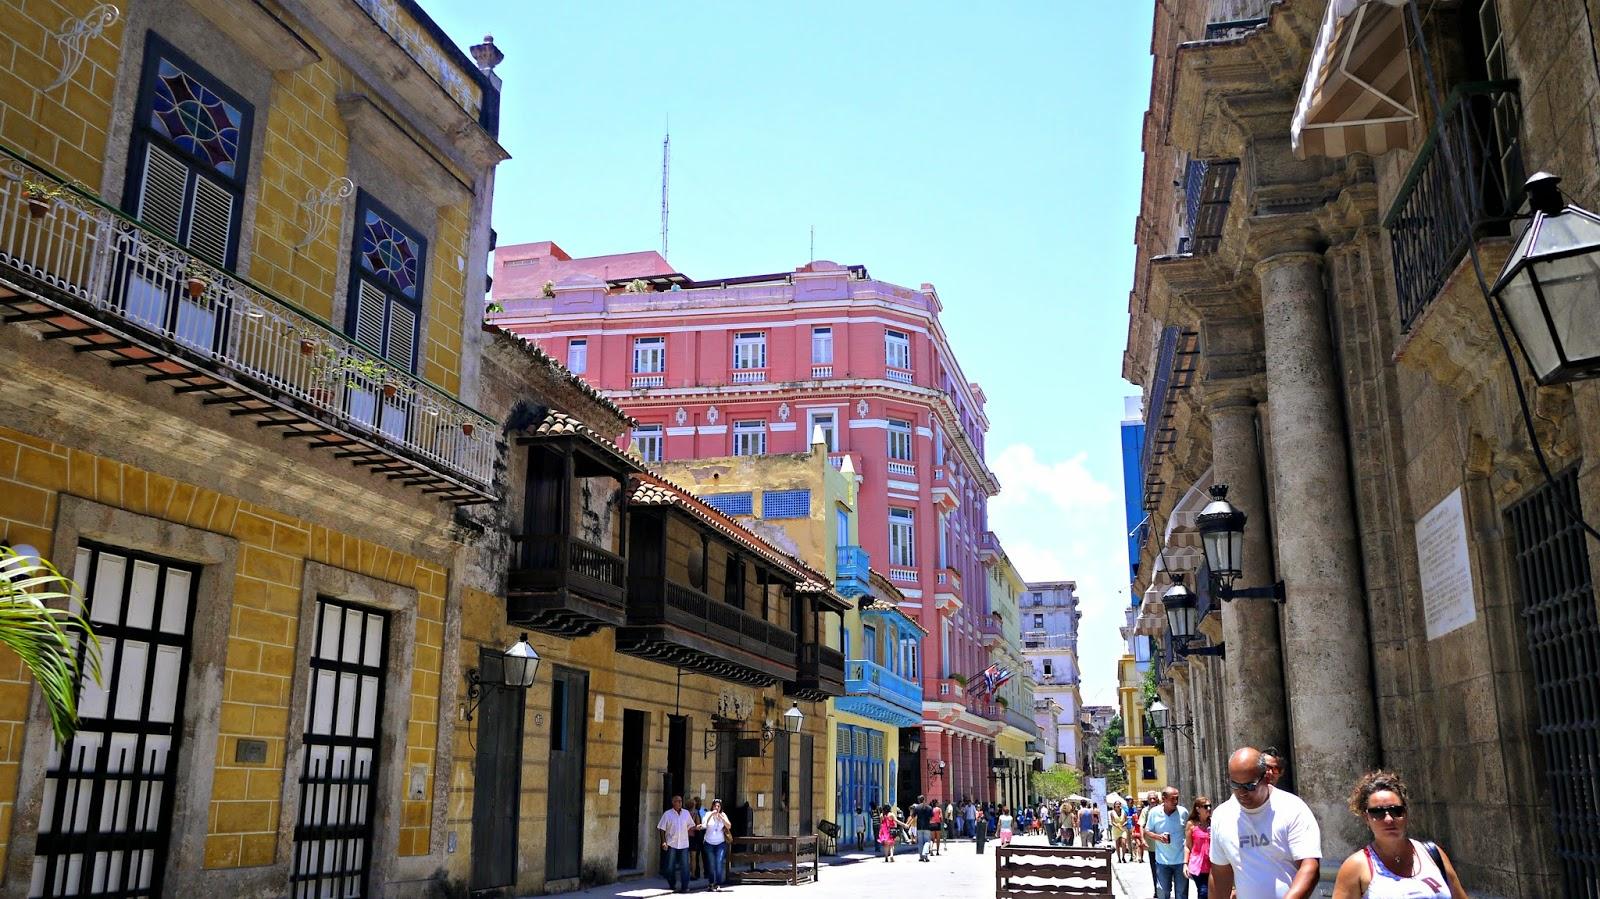 Obispo street in Havana, Cuba